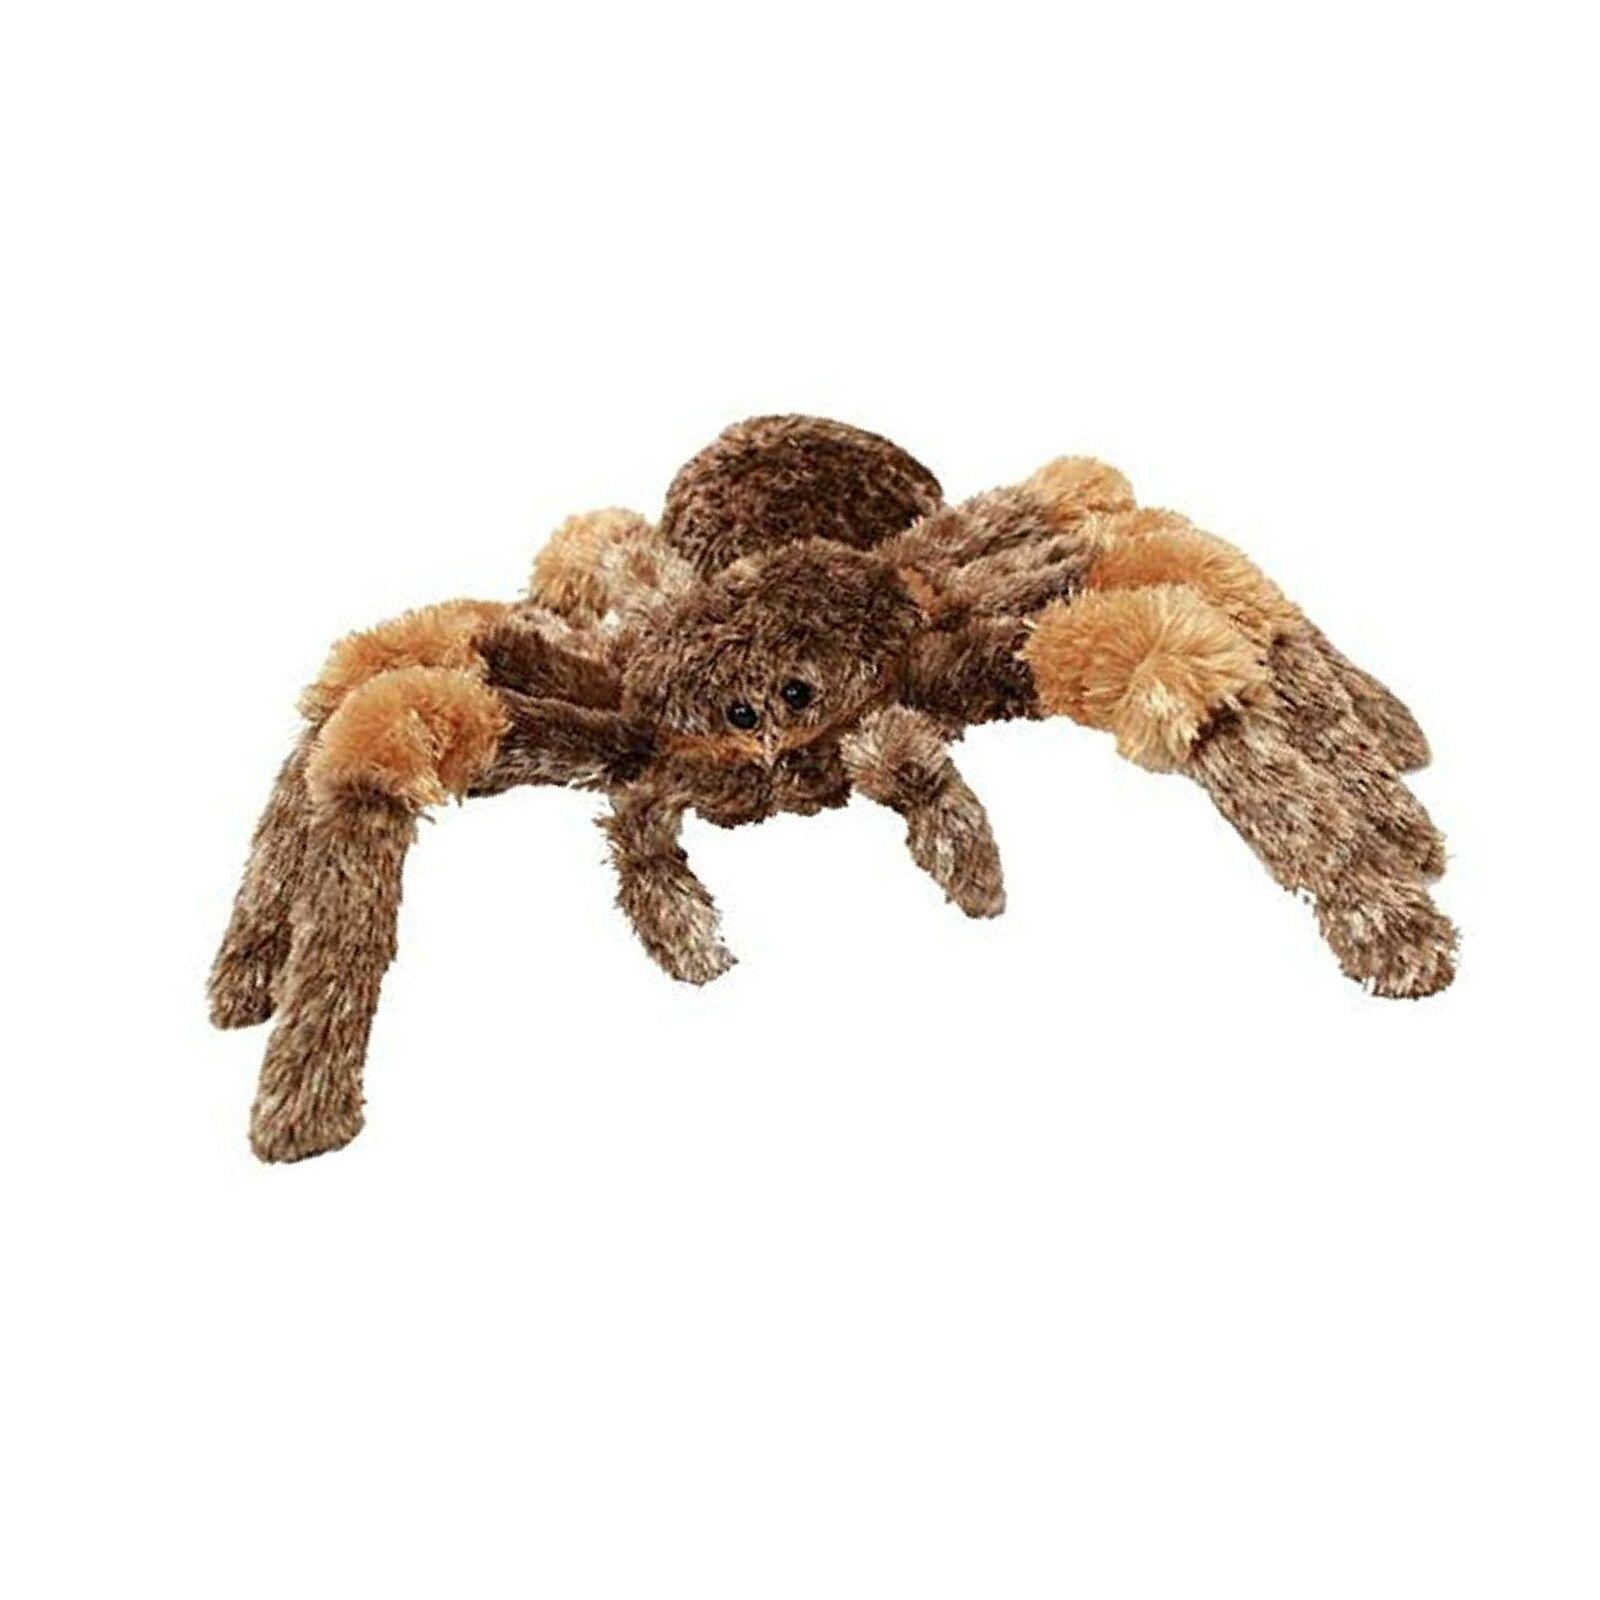 Tarantula Stuffed Animal, Wishpets Stuffed Animal Soft Plush Toy For Kids 9 Tarantula For Sale Online